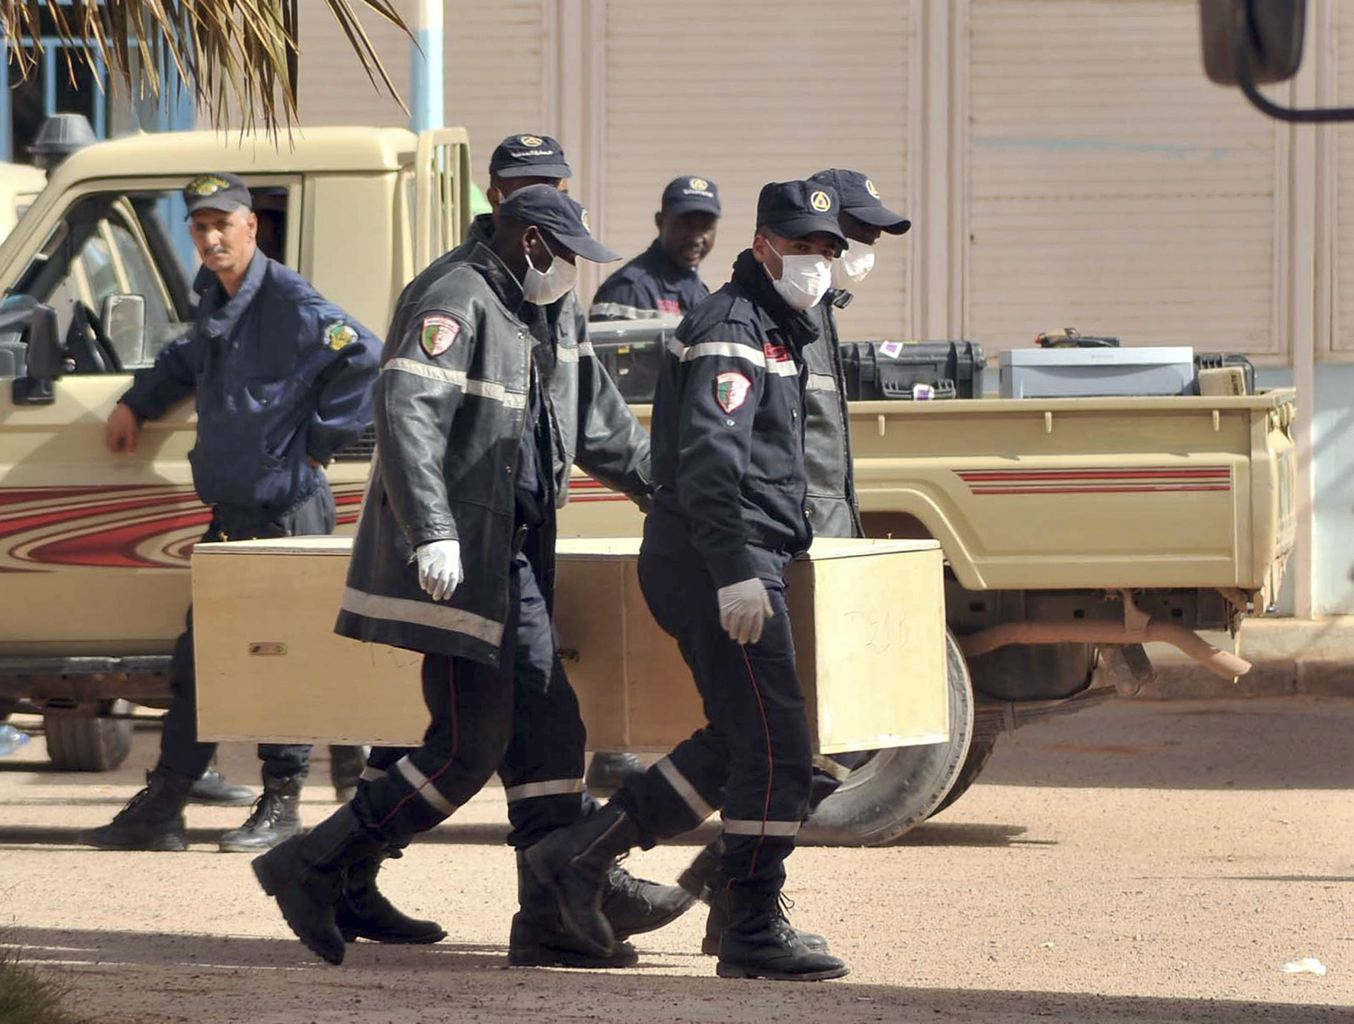 <font color=red>阿尔及利亚人质事件</font>致37名外国人遇难 两加拿